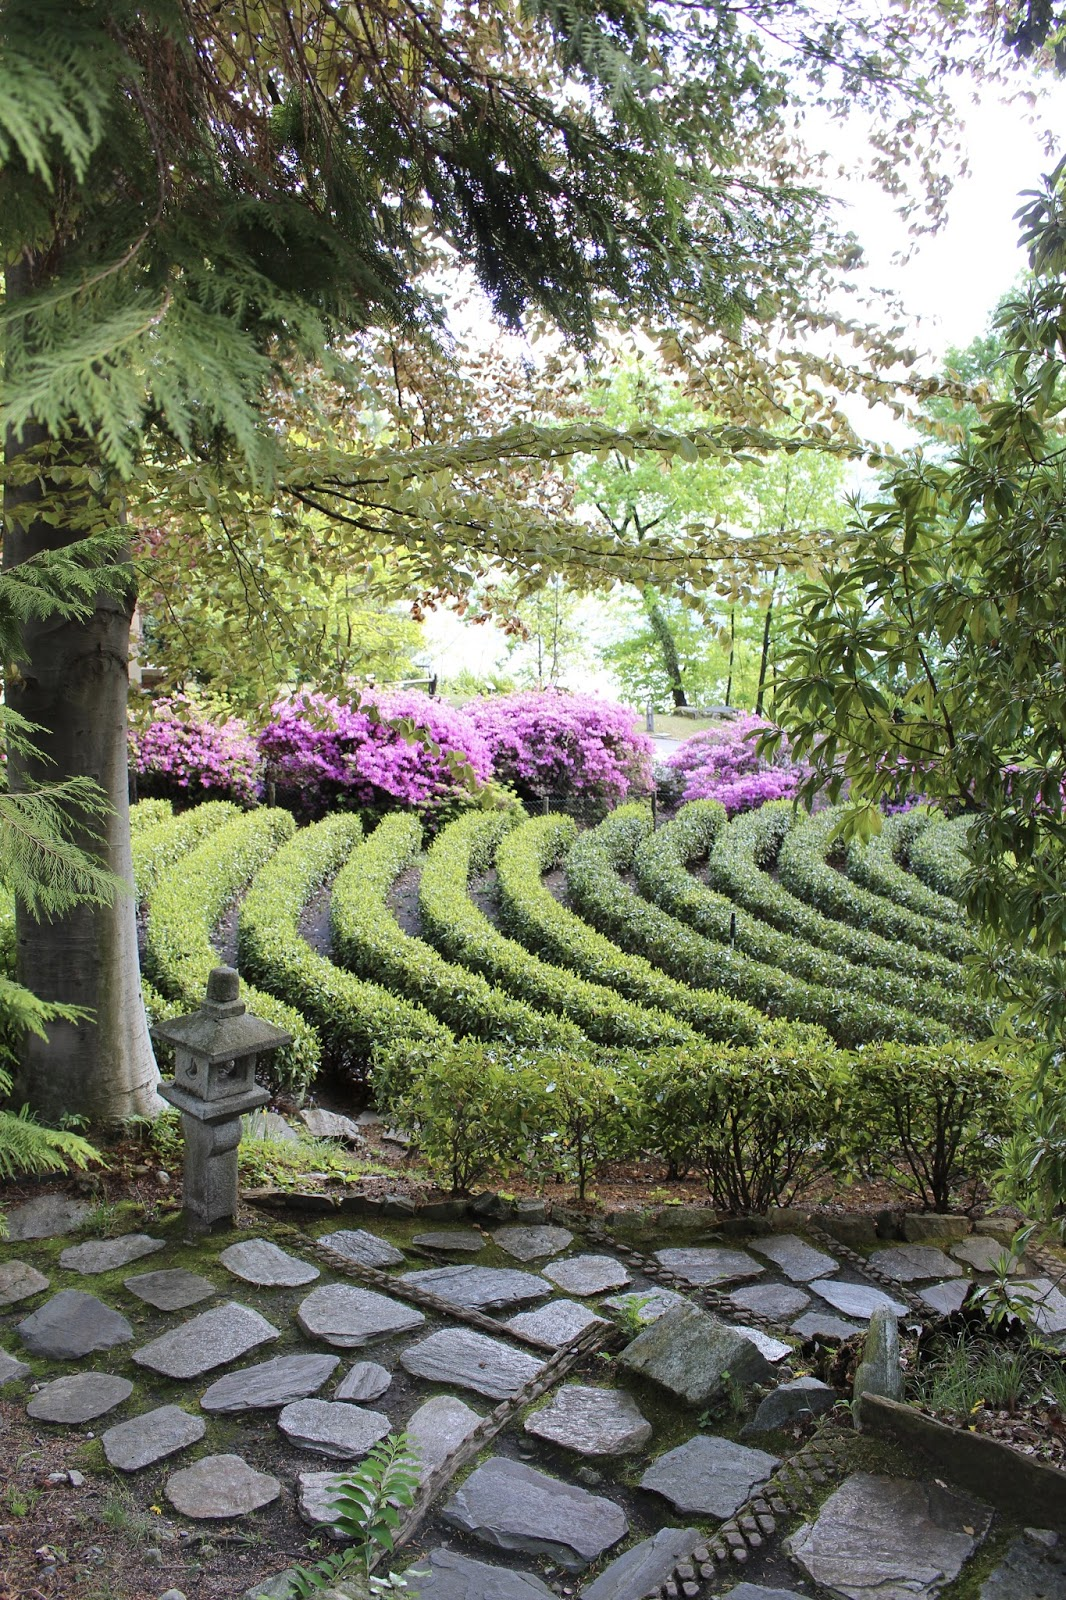 Teegarten auf dem Monte Verità, Ticino